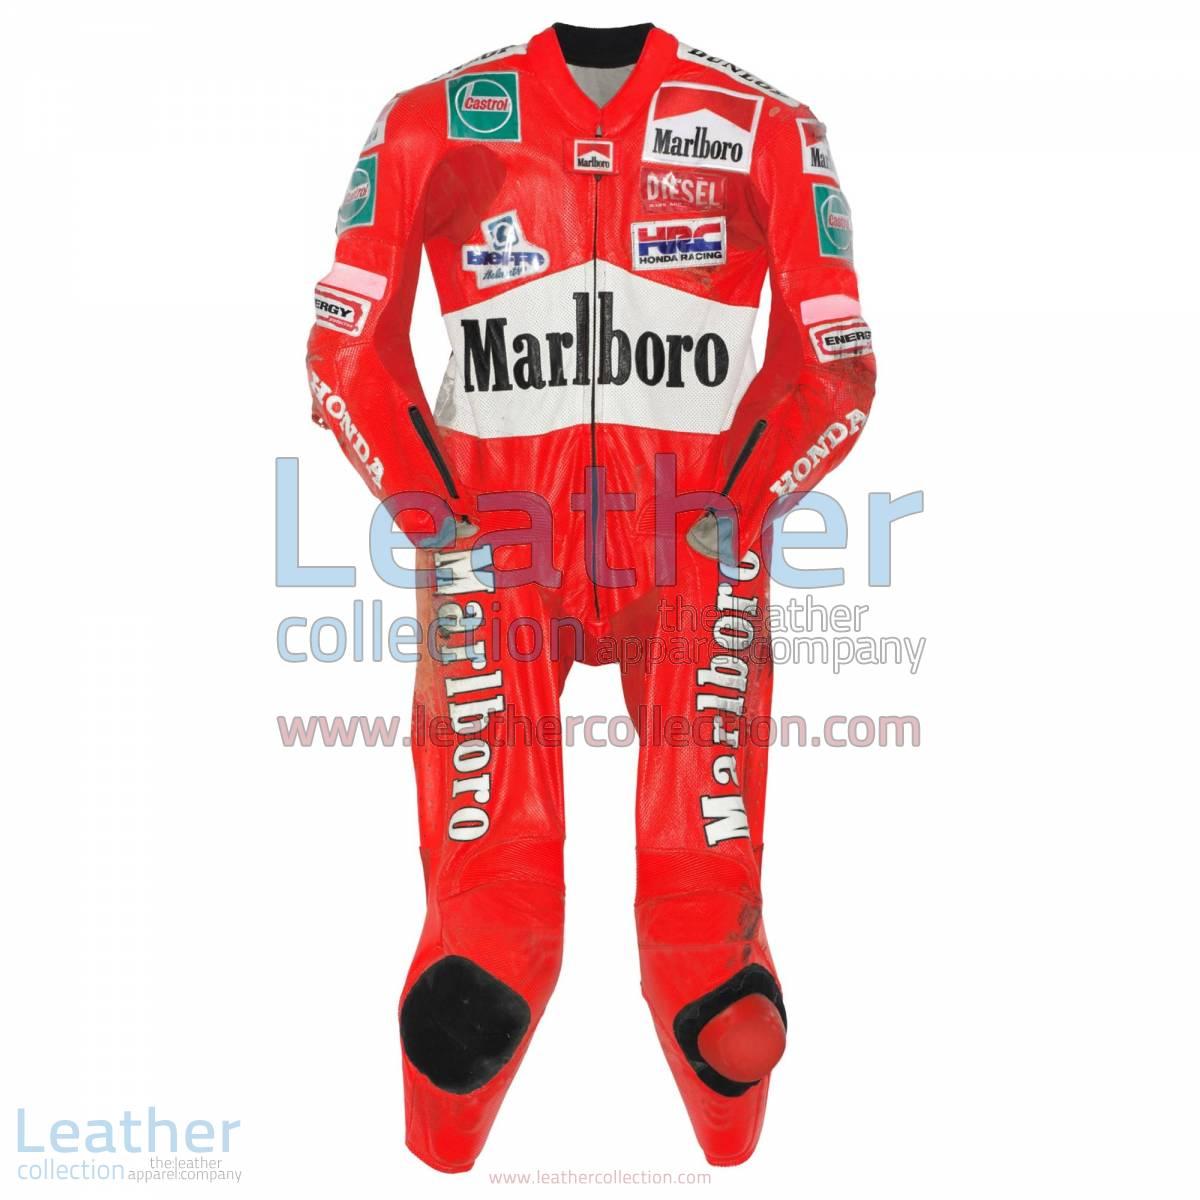 Max Biaggi Honda GP 1997 Racing Leathers   honda leathers